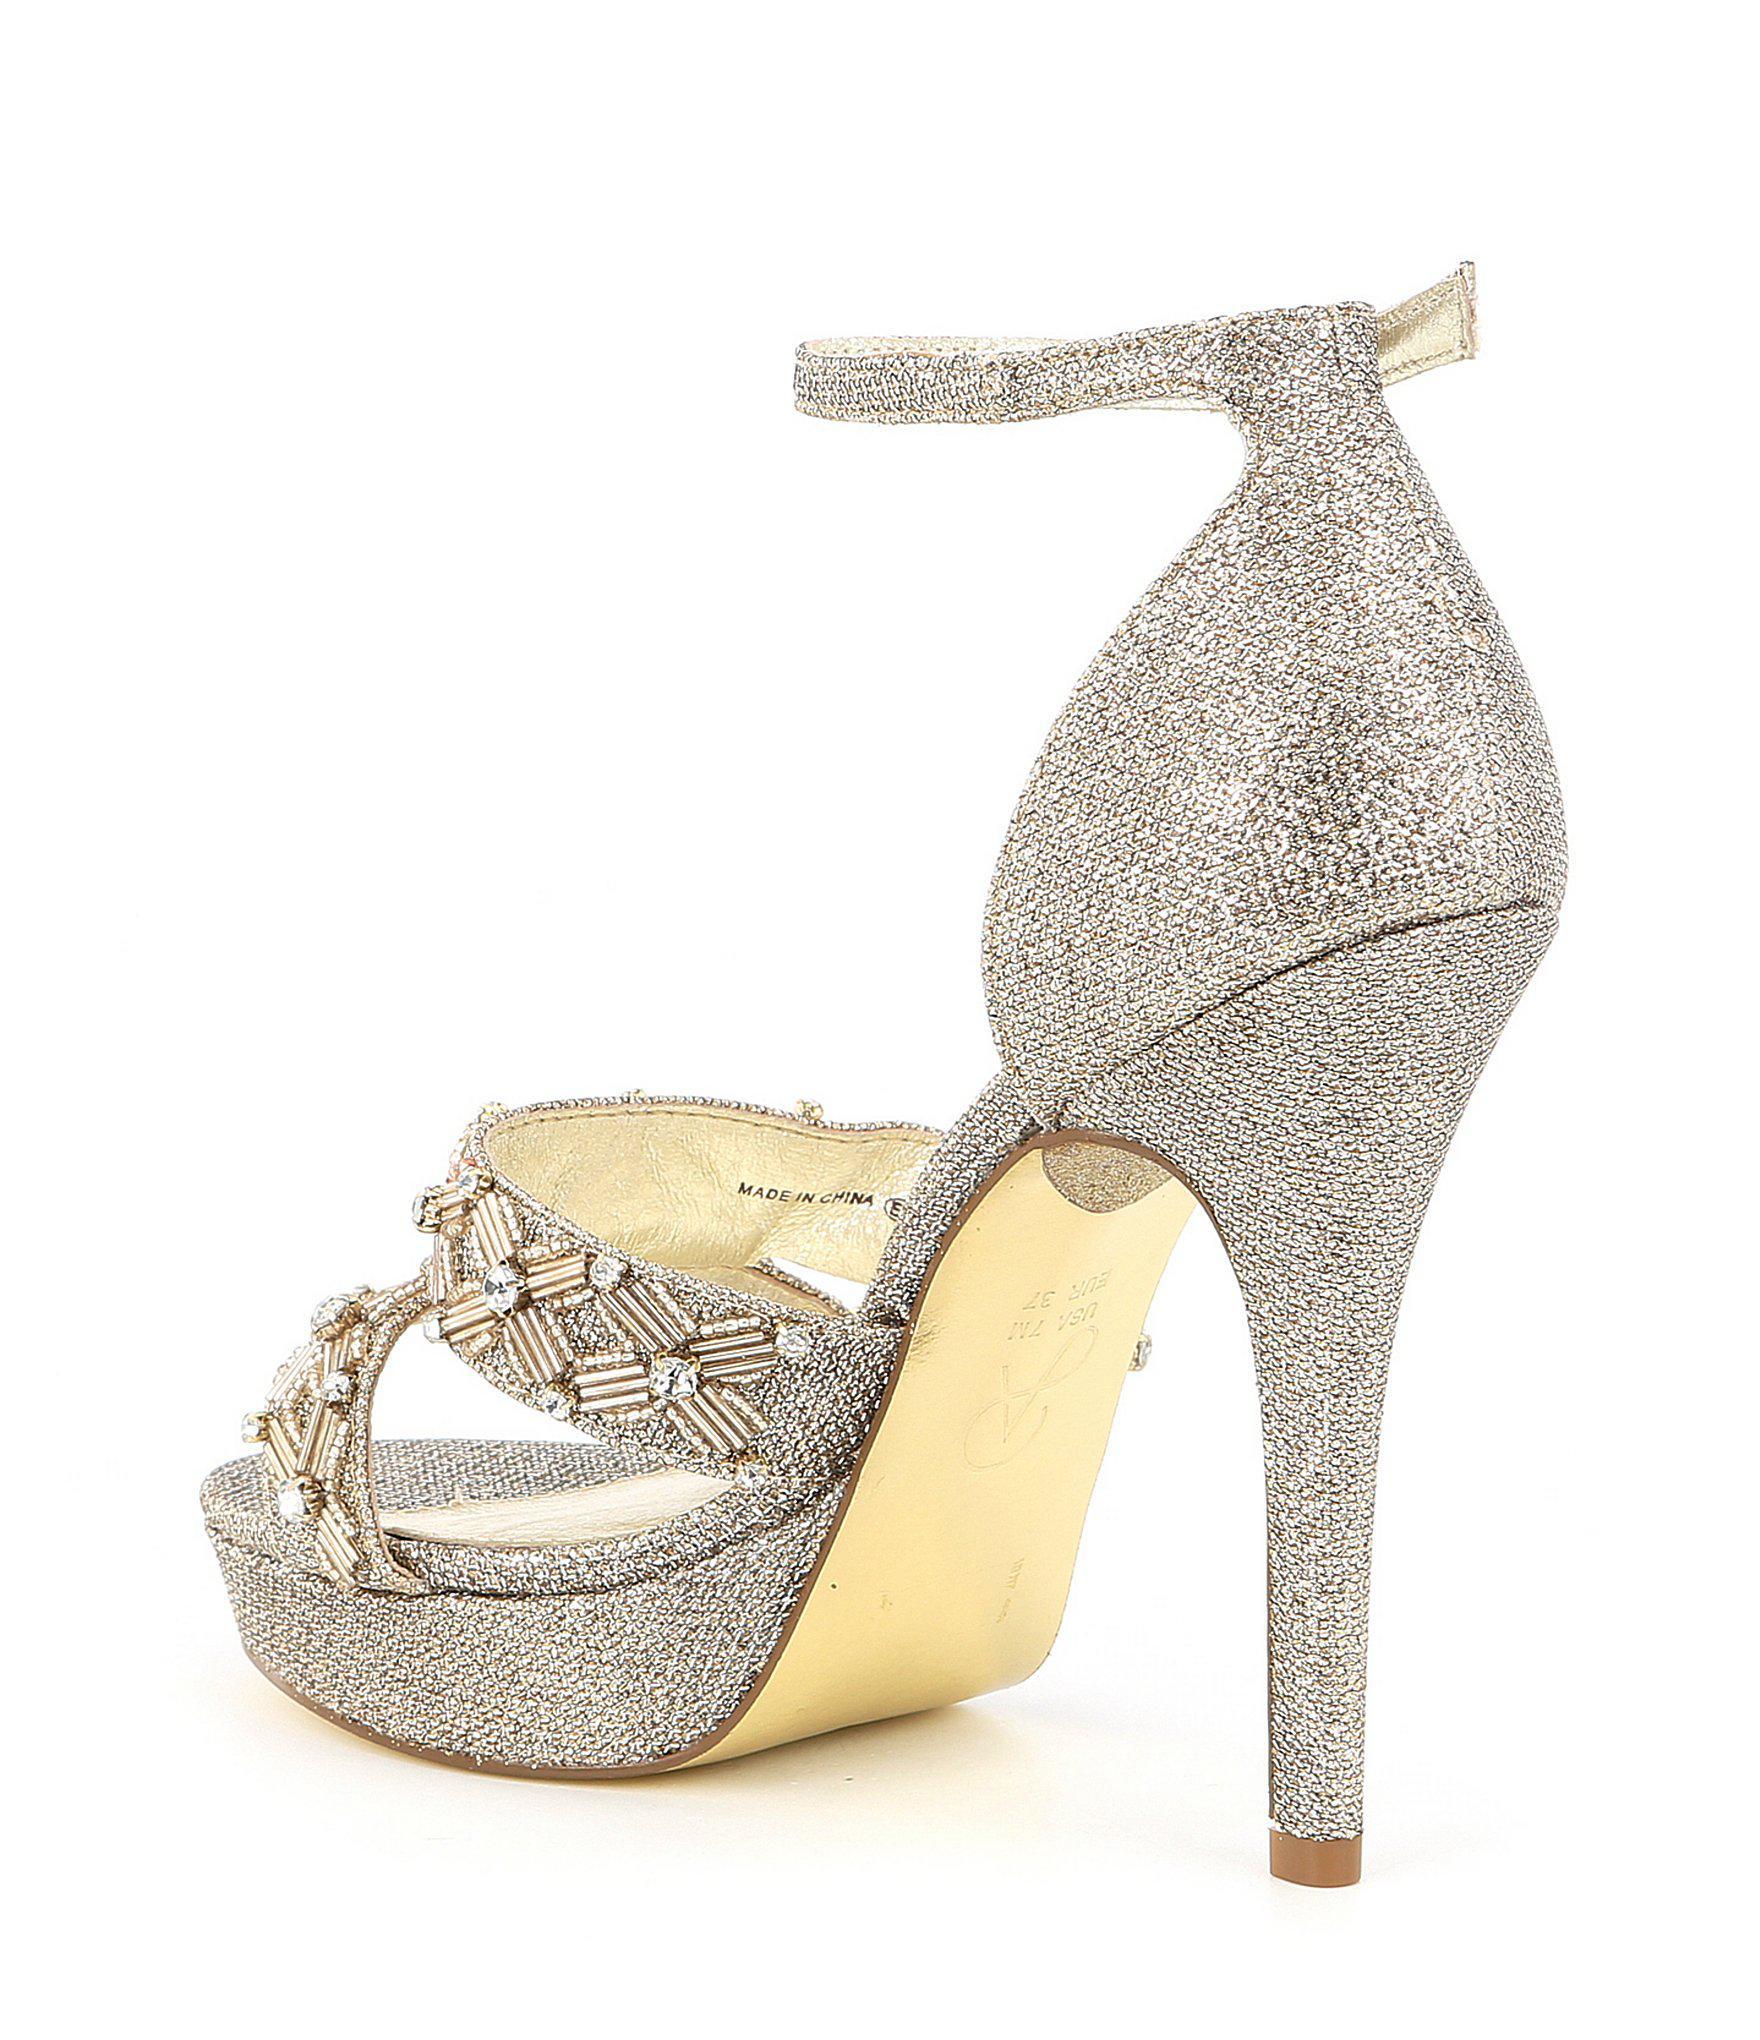 e35e9d6b58a Adrianna Papell - Marietta Metallic Jeweled Ankle Strap Platform Dress  Sandals - Lyst. View fullscreen